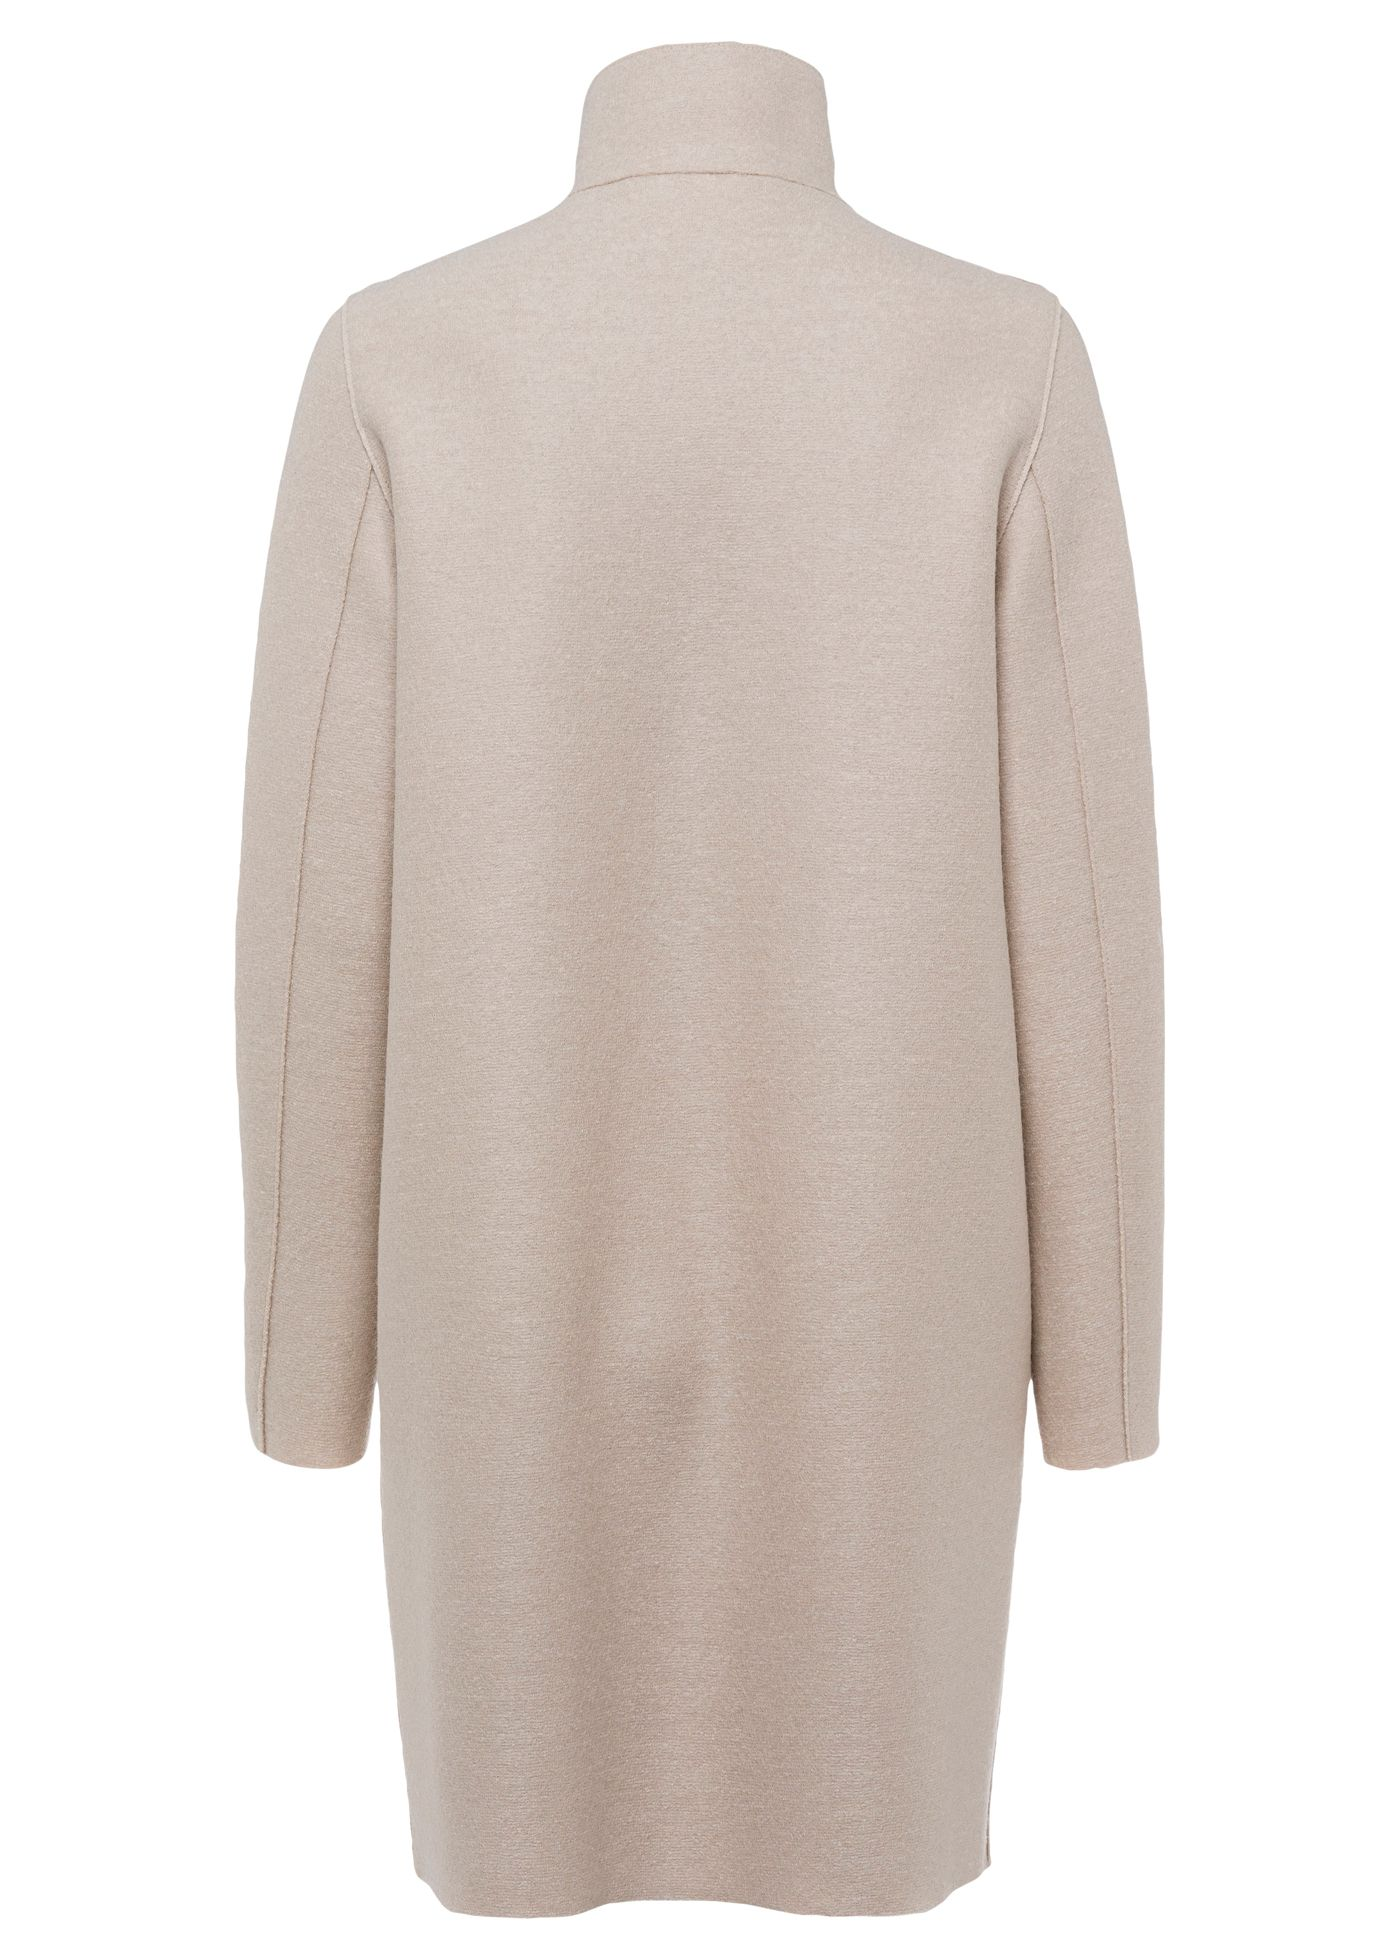 Women egg shaped coat pressed wool image number 1